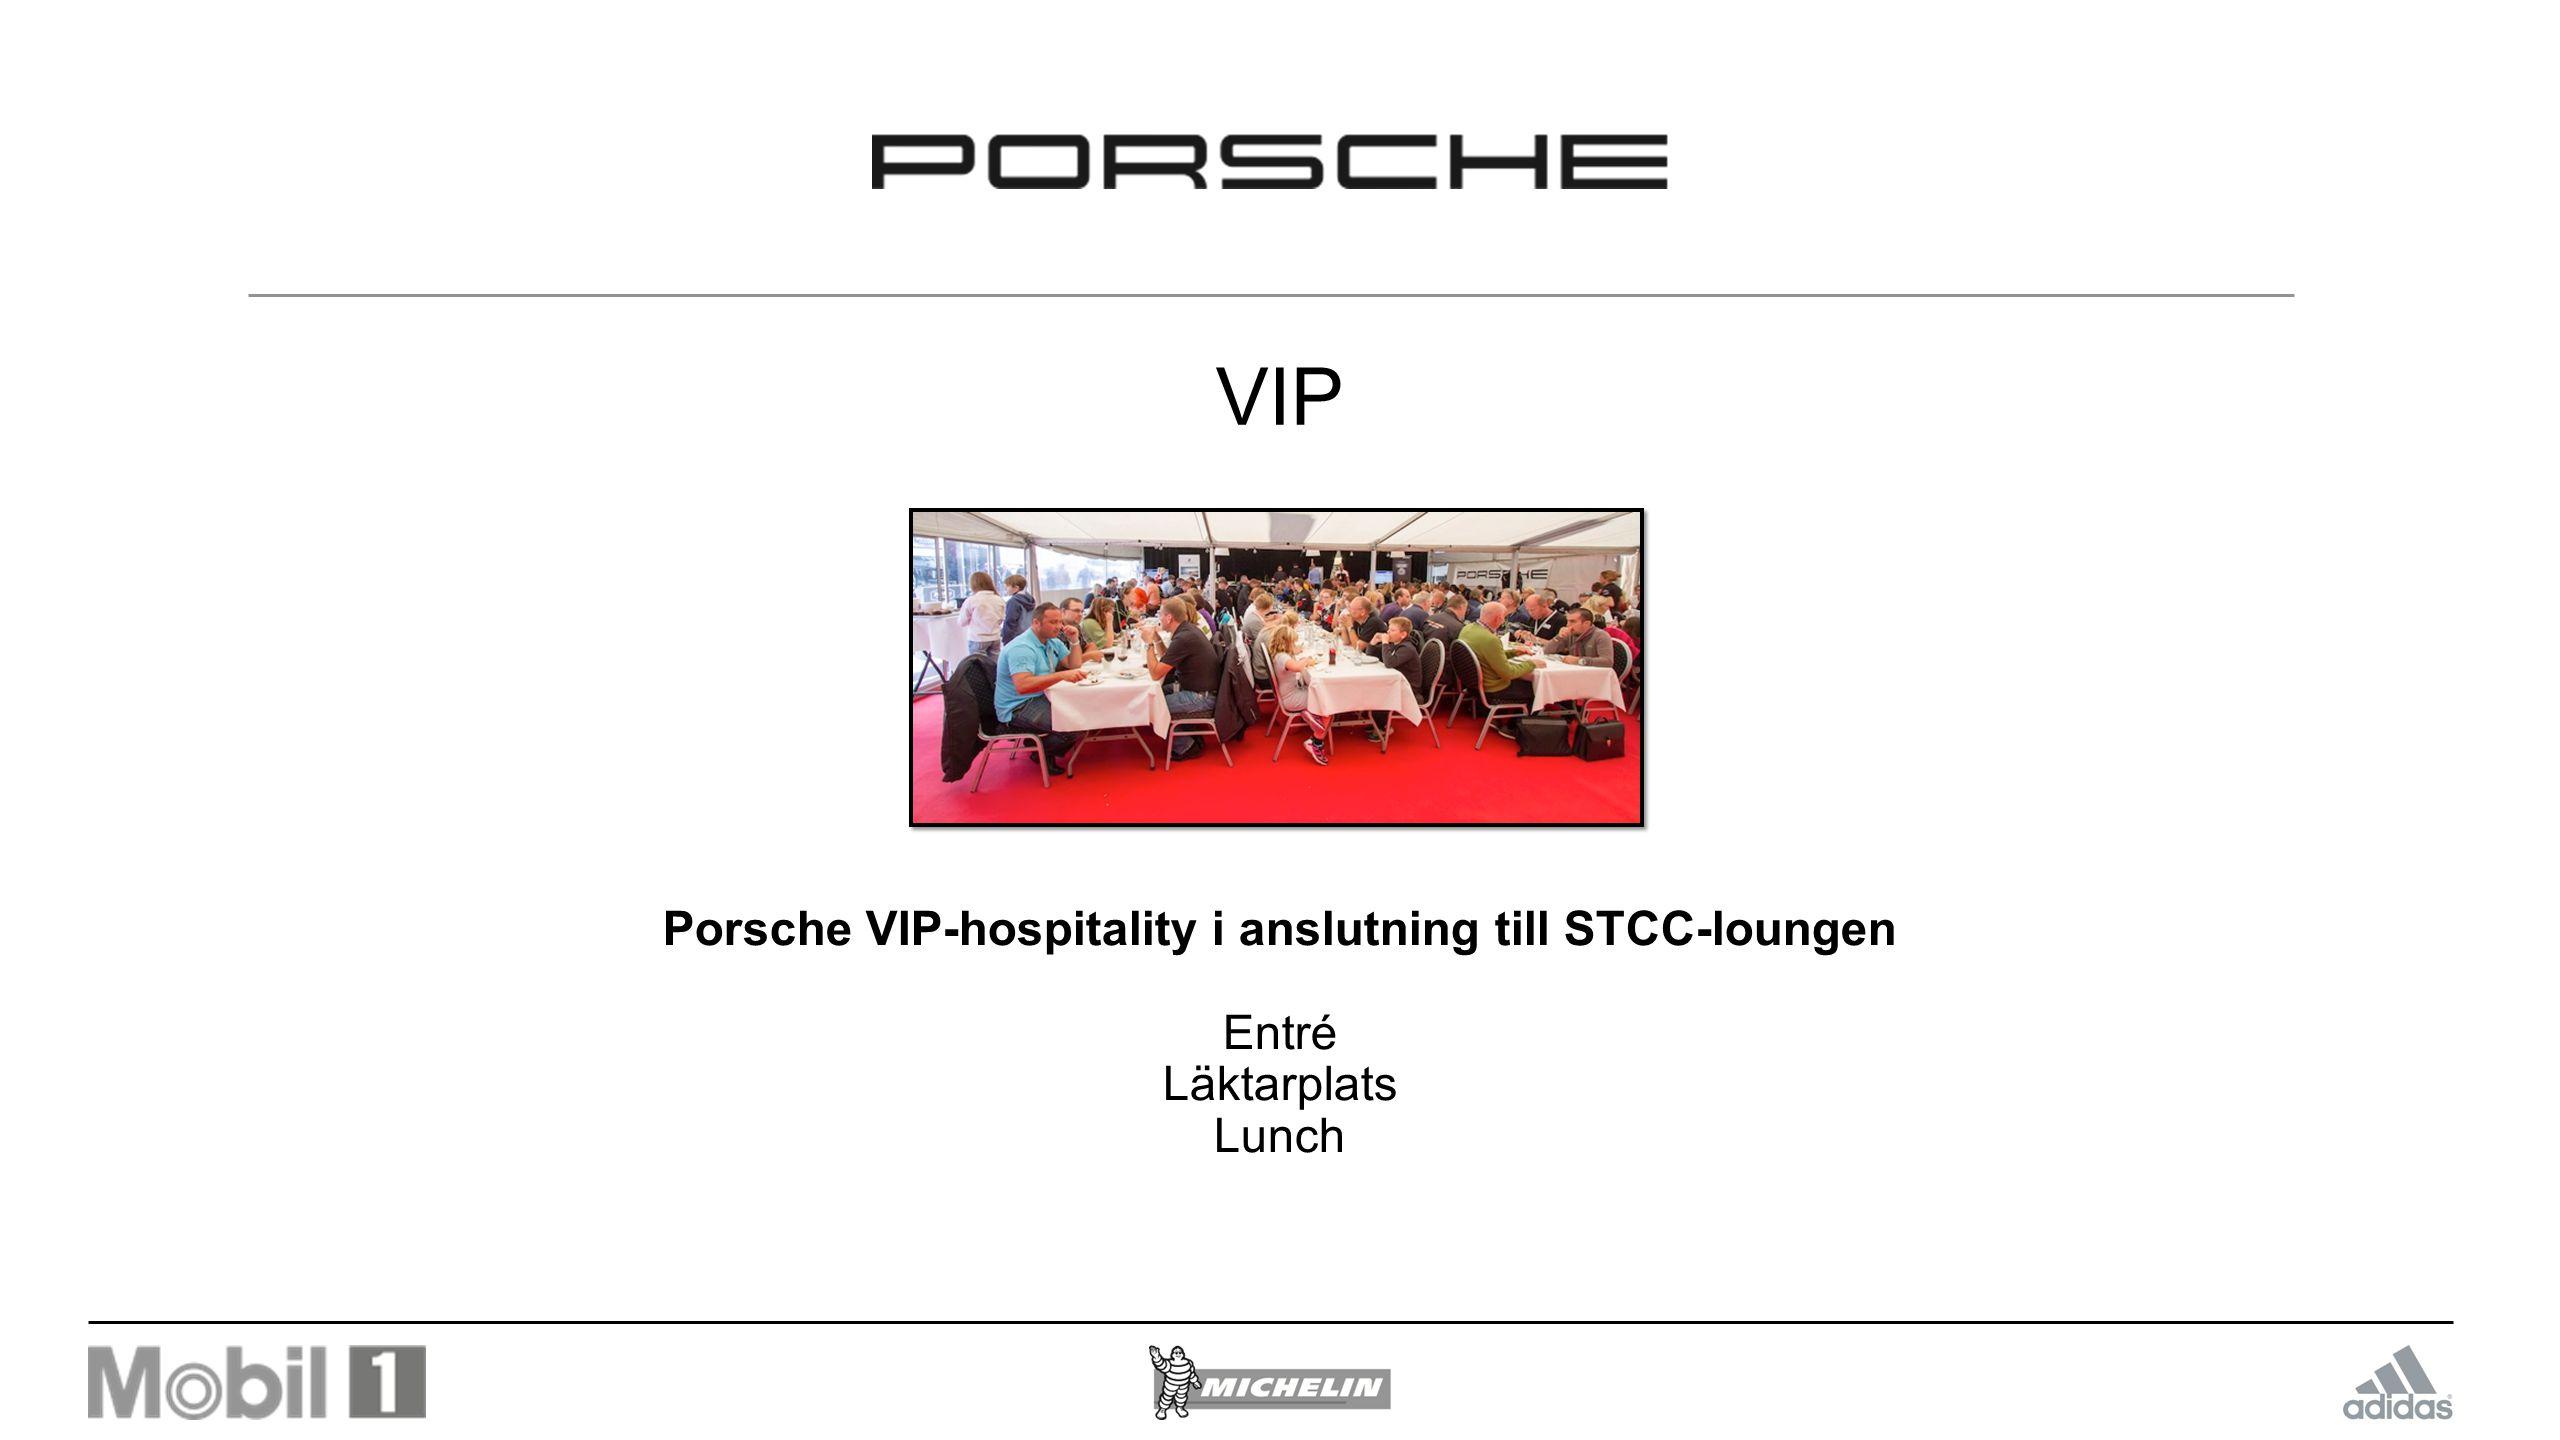 Porsche VIP-hospitality i anslutning till STCC-loungen